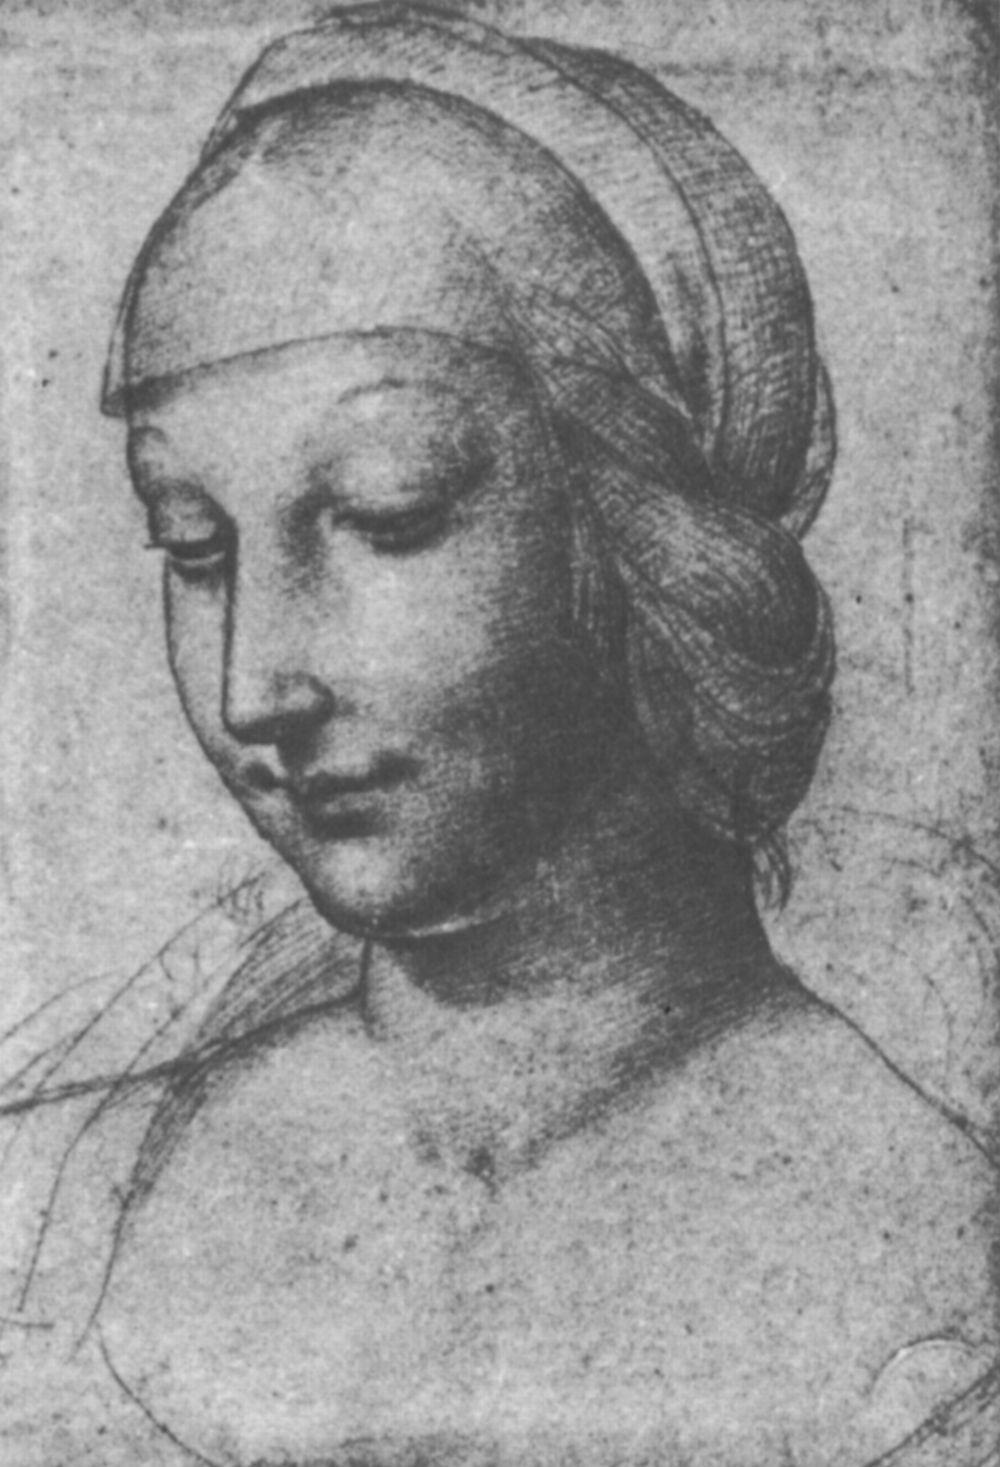 Raphael Sanzio. The woman's head half-turned